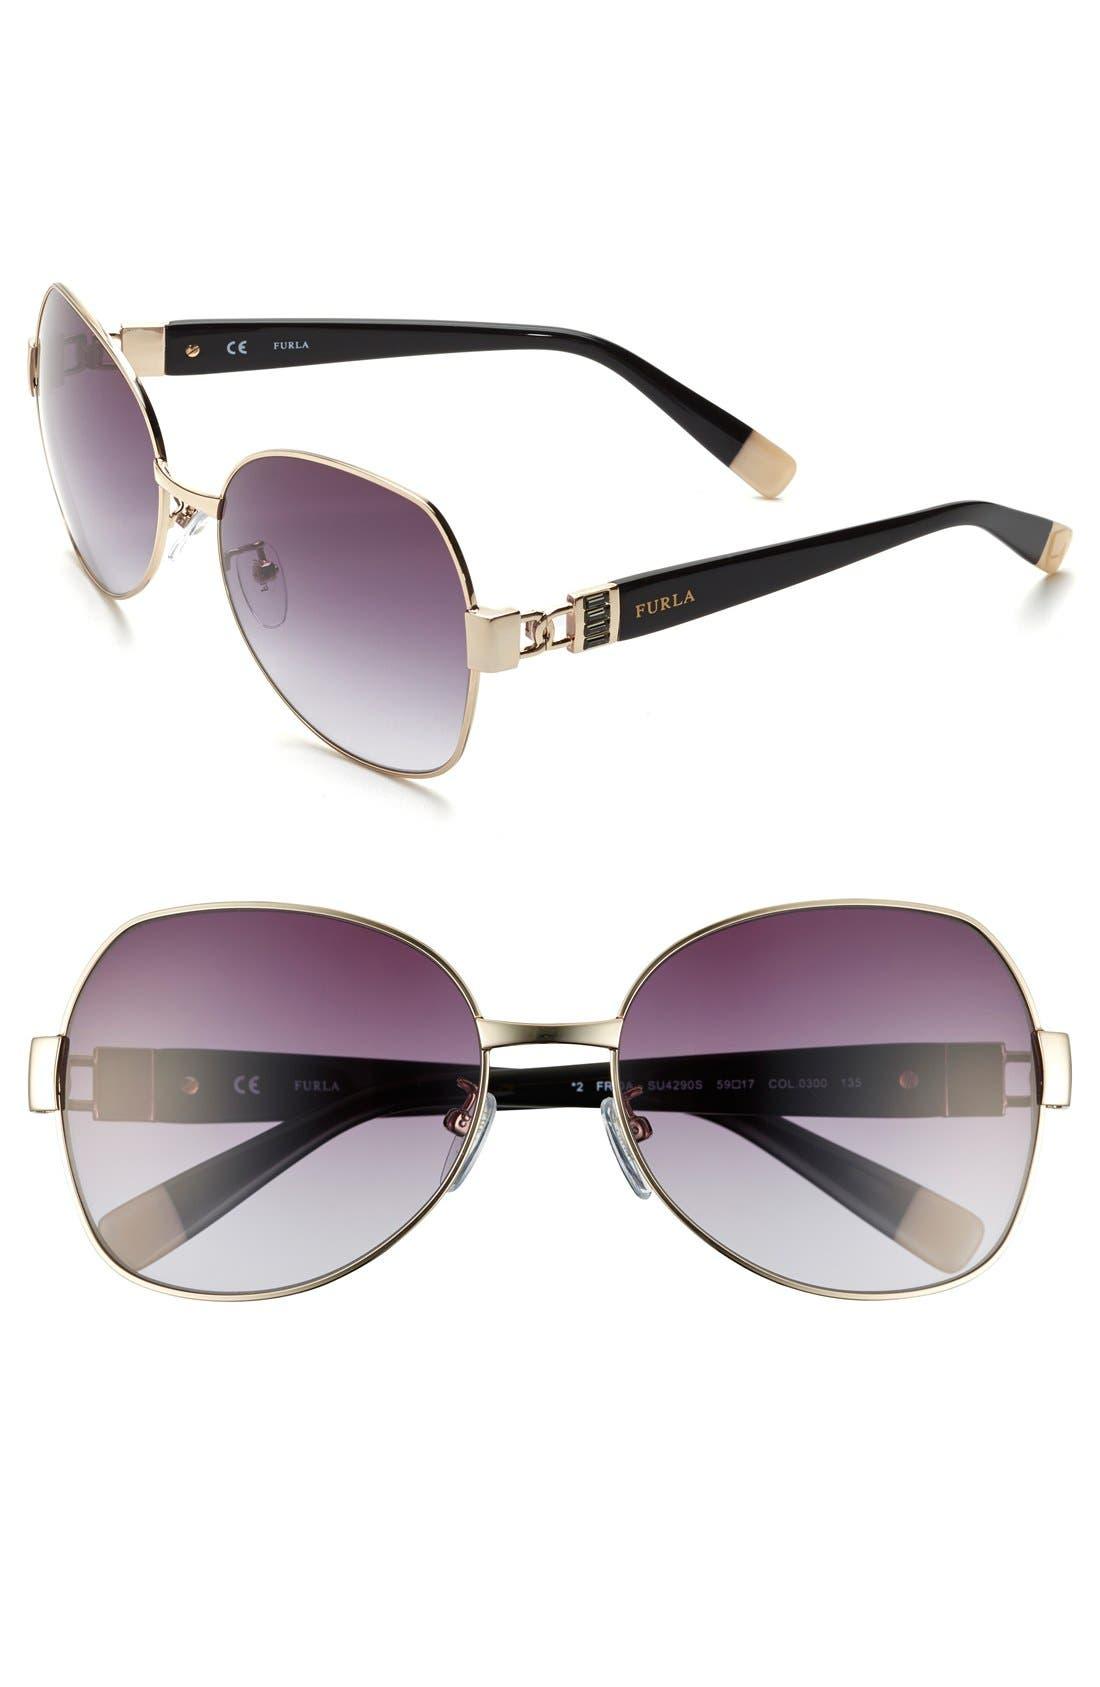 Main Image - Furla 59mm Swarovski Crystal Sunglasses